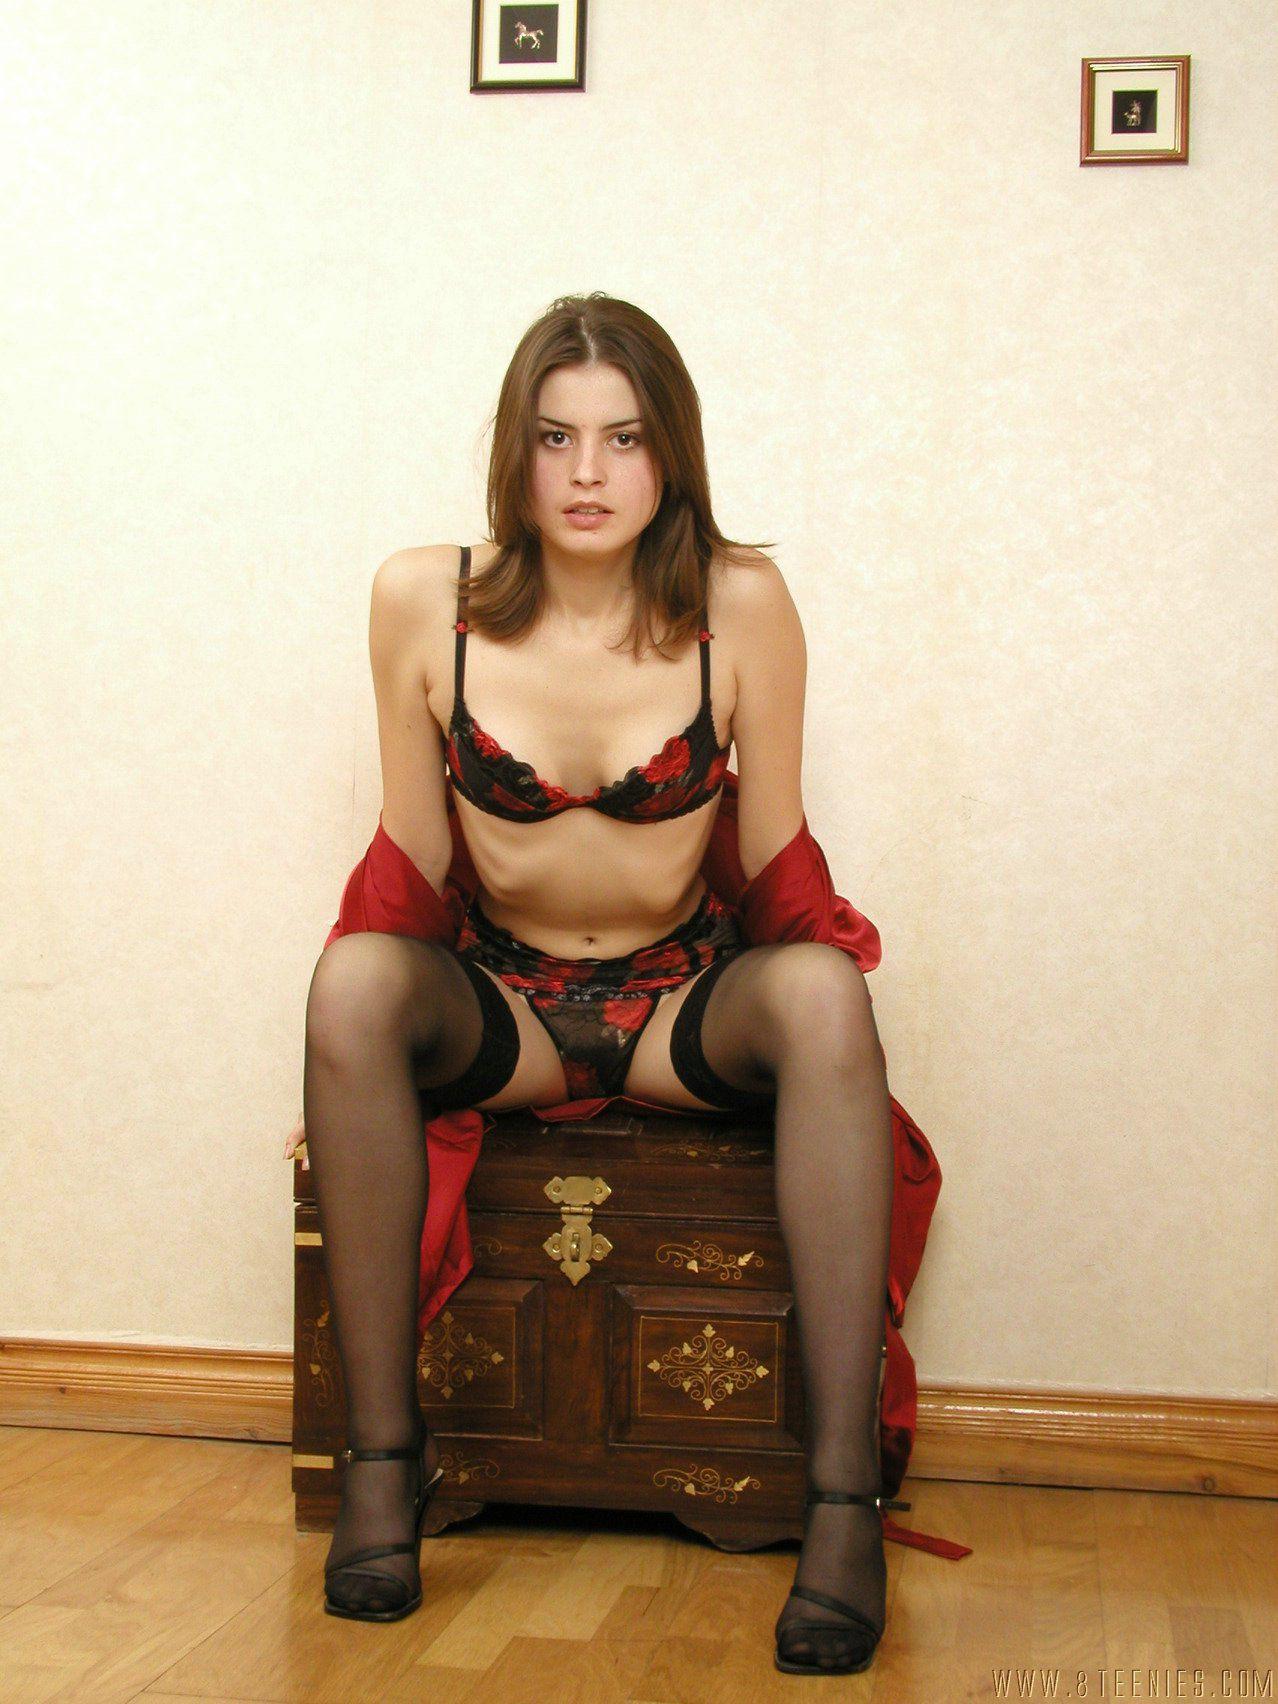 http://i1.imageban.ru/out/2013/11/26/df4debb31d56ce0771587940ce16f821.jpg